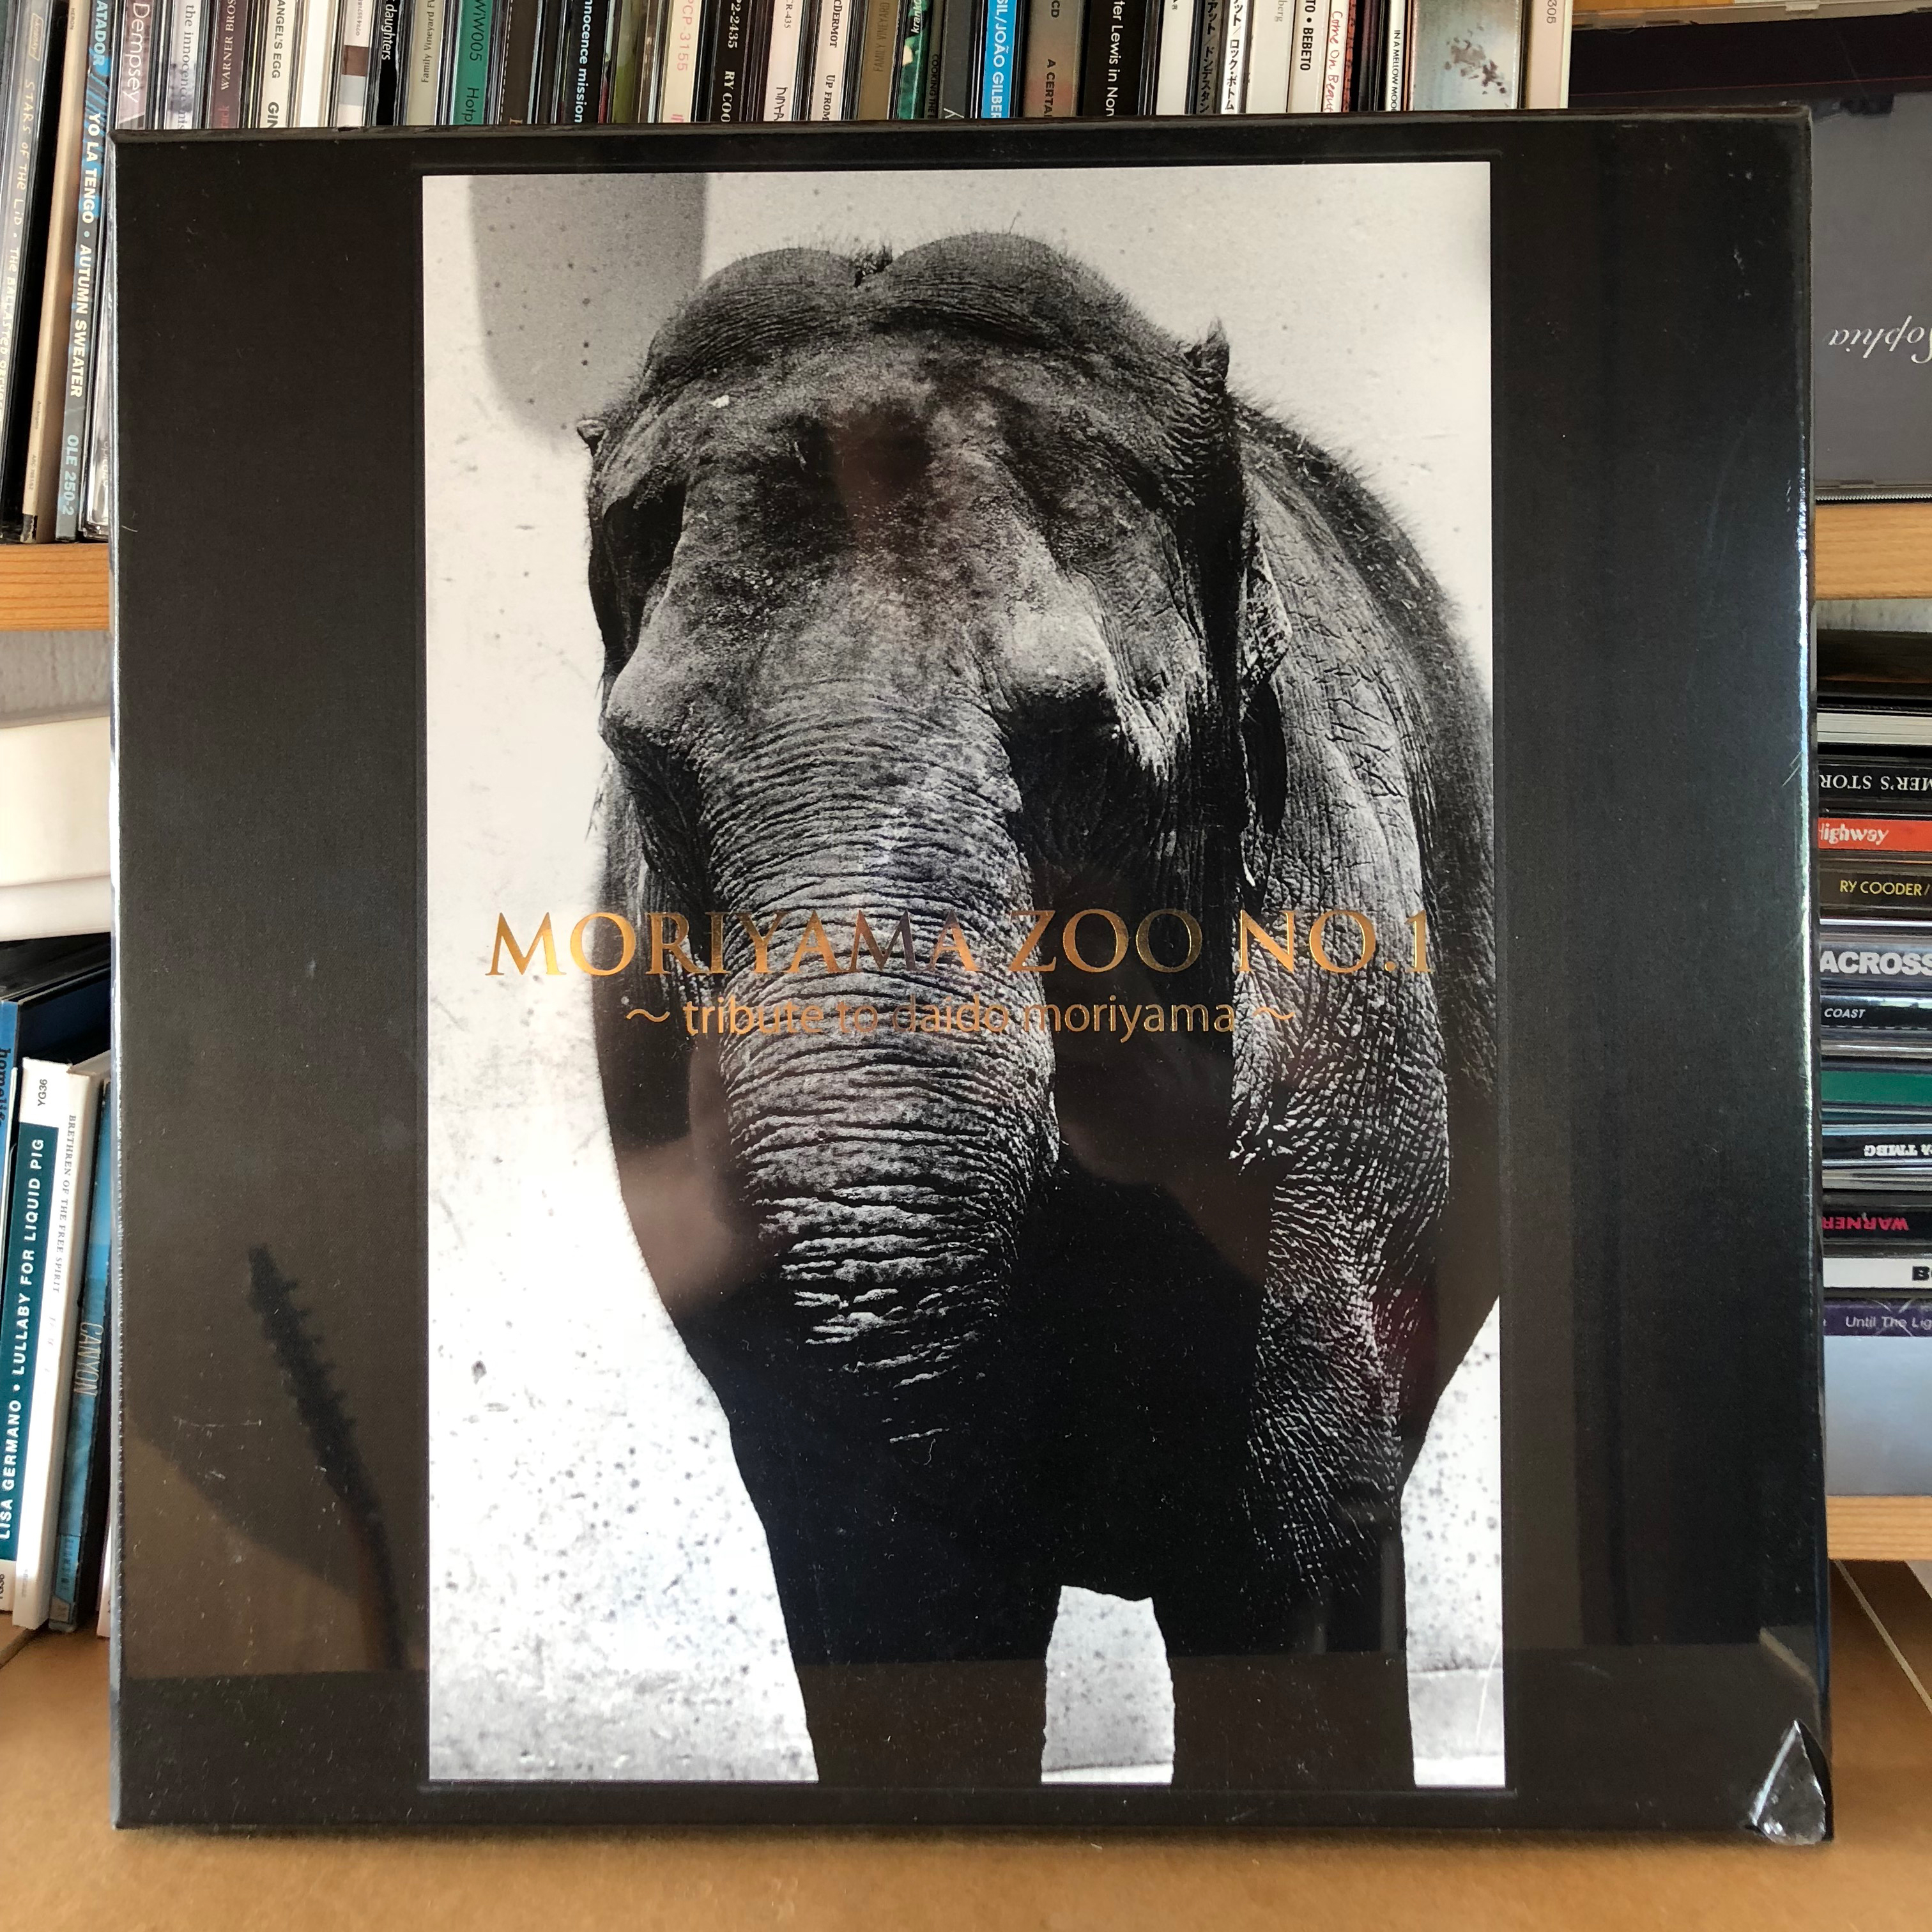 V.A『森山大道/ Daido Moriyama:Moriyama Zoo No.1』(Powershovel Audio)